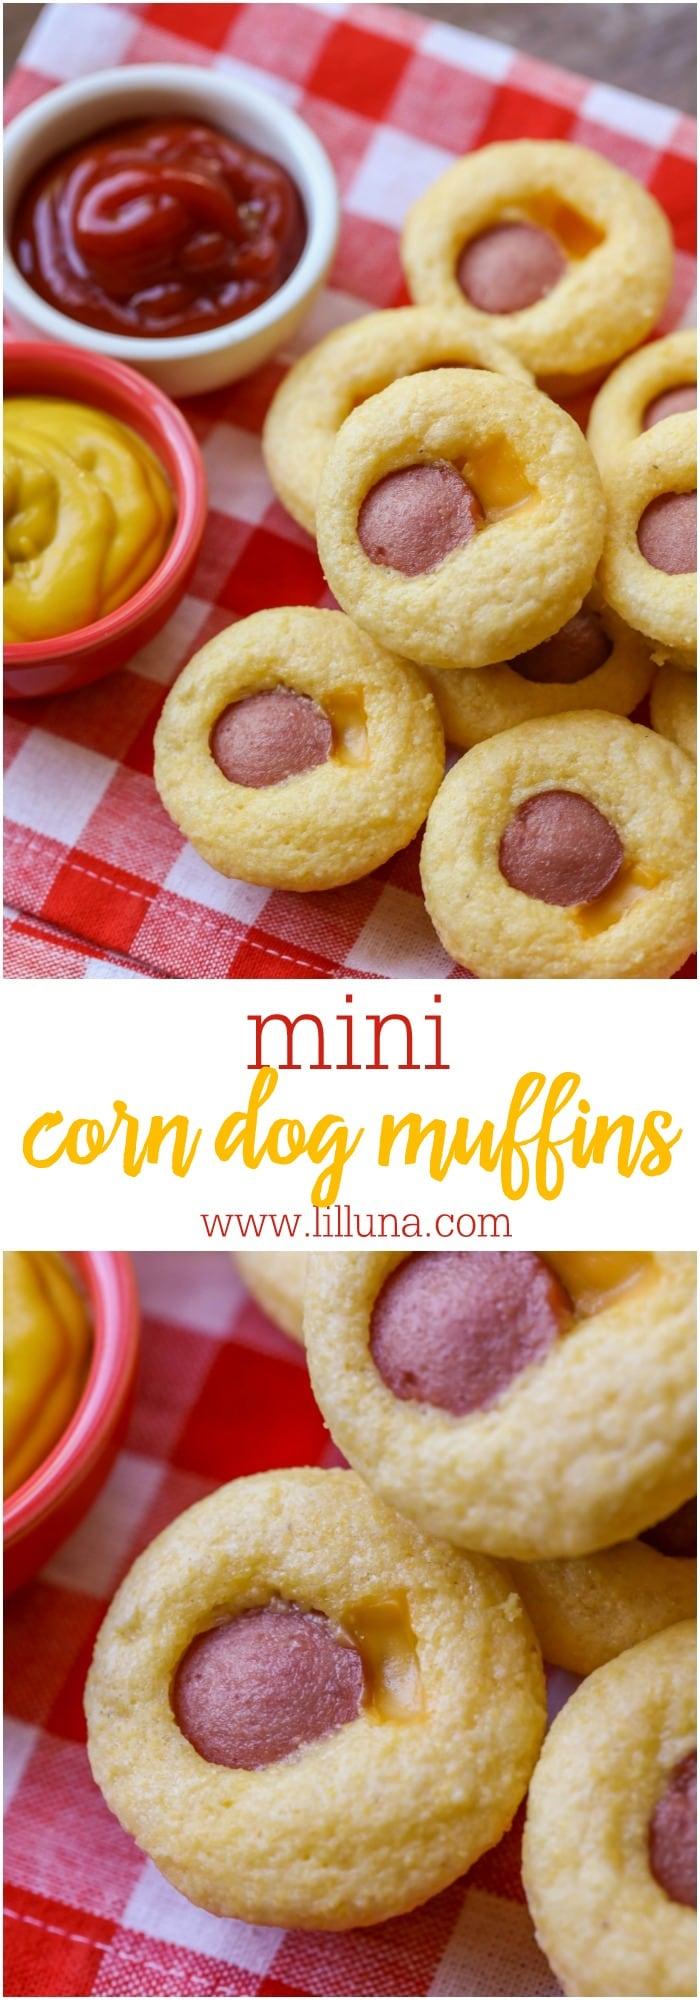 mini corn dog muffins lil 39 luna. Black Bedroom Furniture Sets. Home Design Ideas